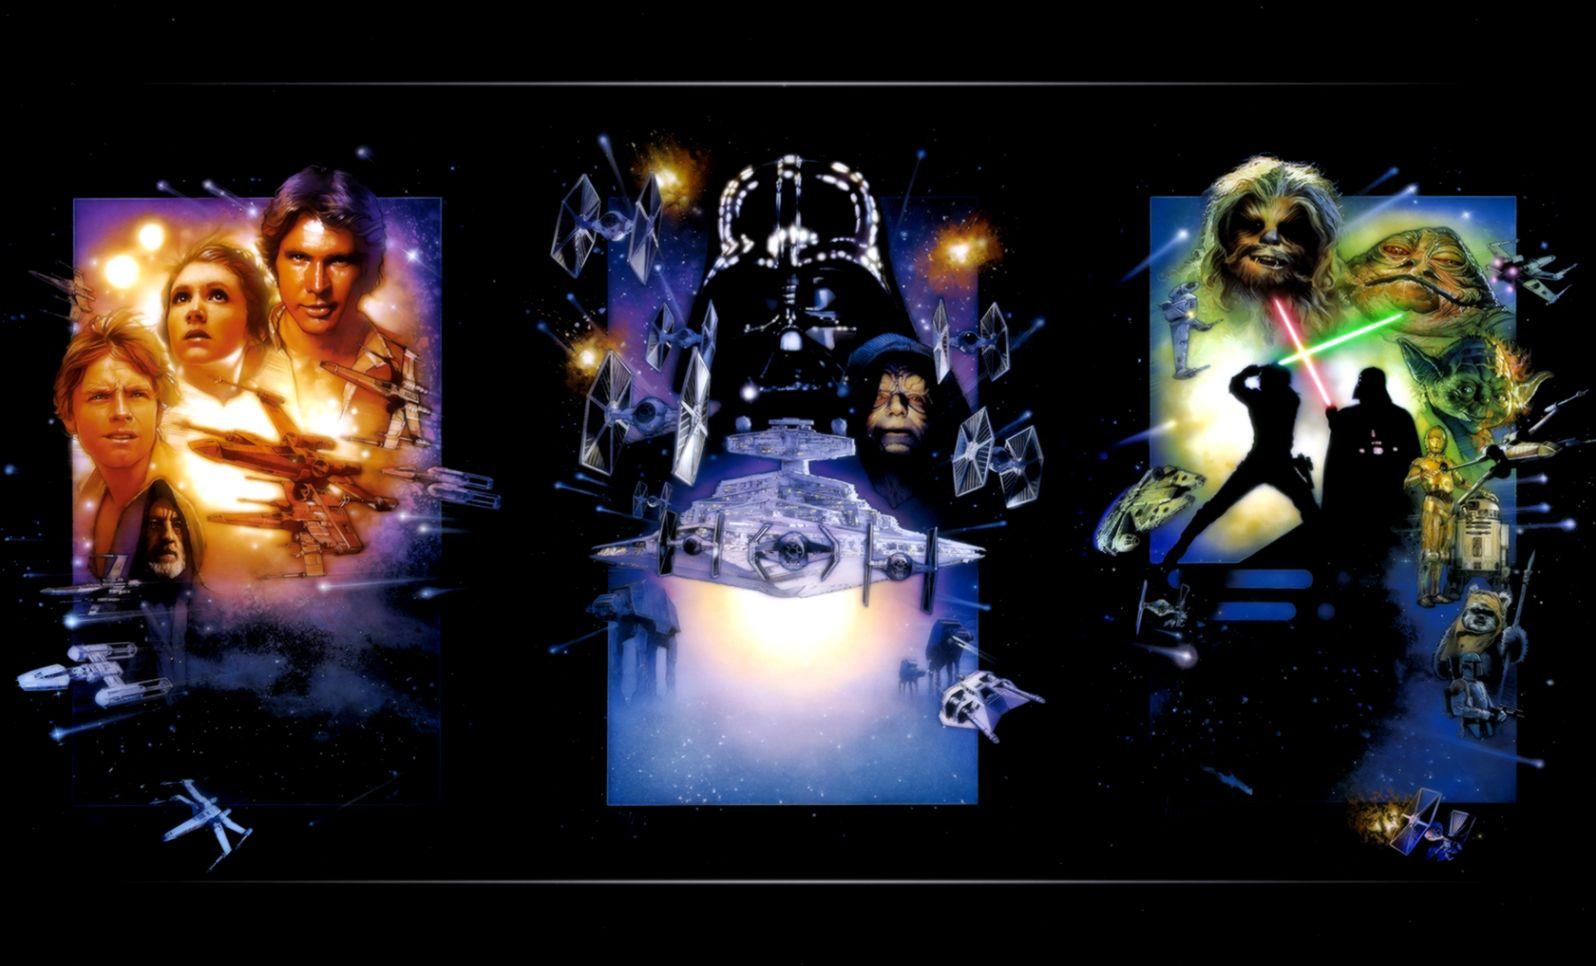 The Star Wars Trilogy Computer Wallpapers Desktop Backgrounds Star Wars Episode V The Empire Strikes Back Cover 1596x966 Download Hd Wallpaper Wallpapertip